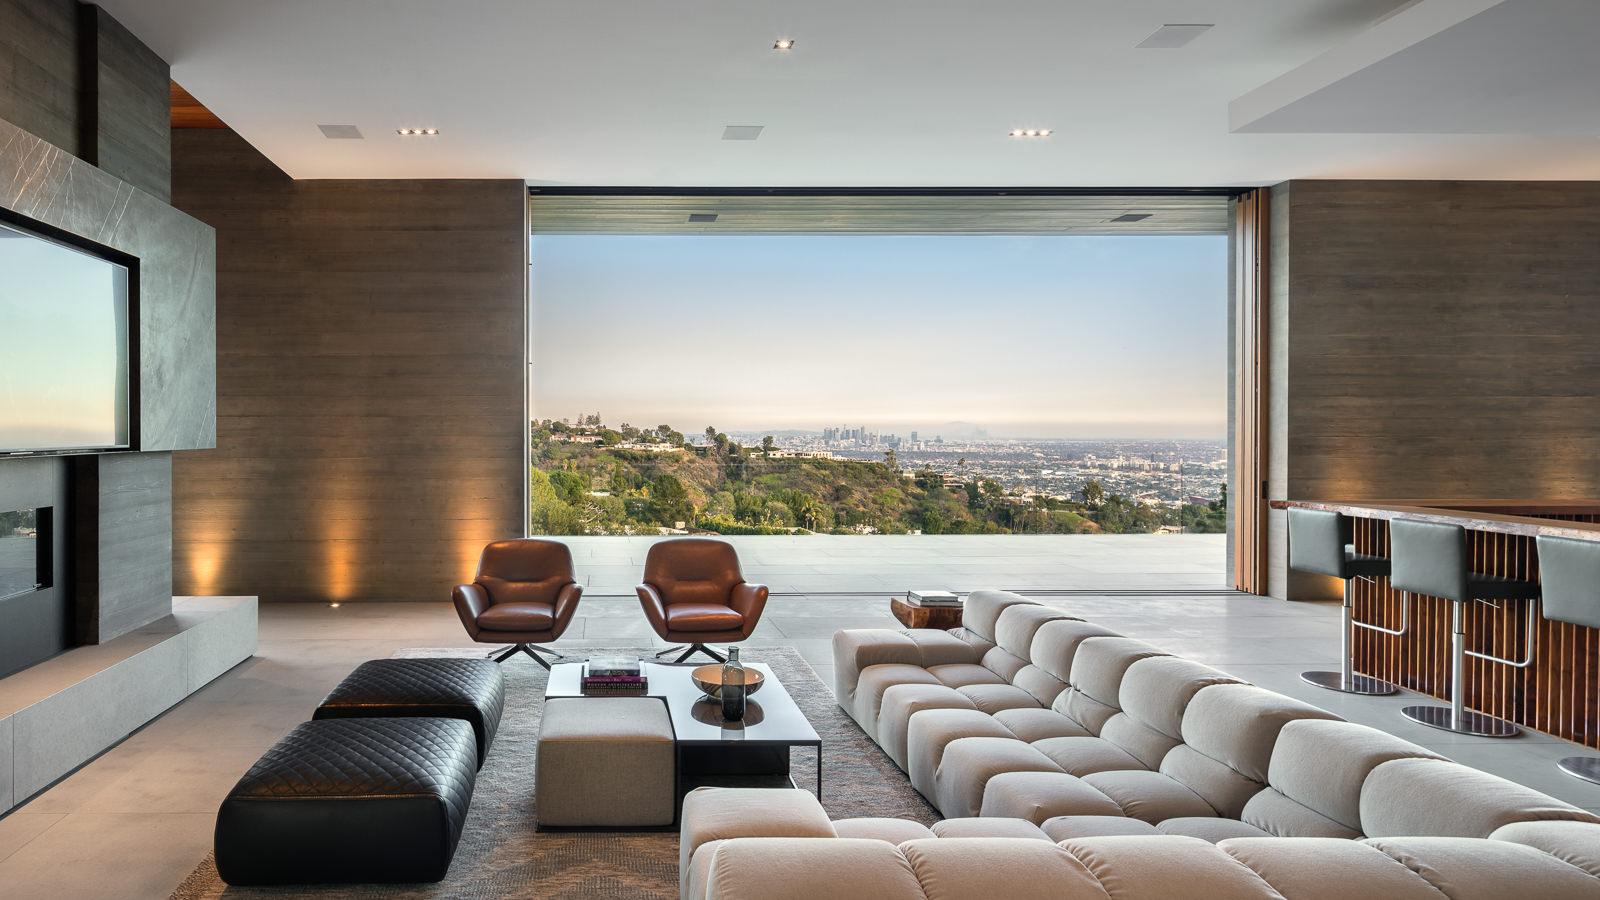 Beverly Hills Residence - CJ Bonura / SACA Development